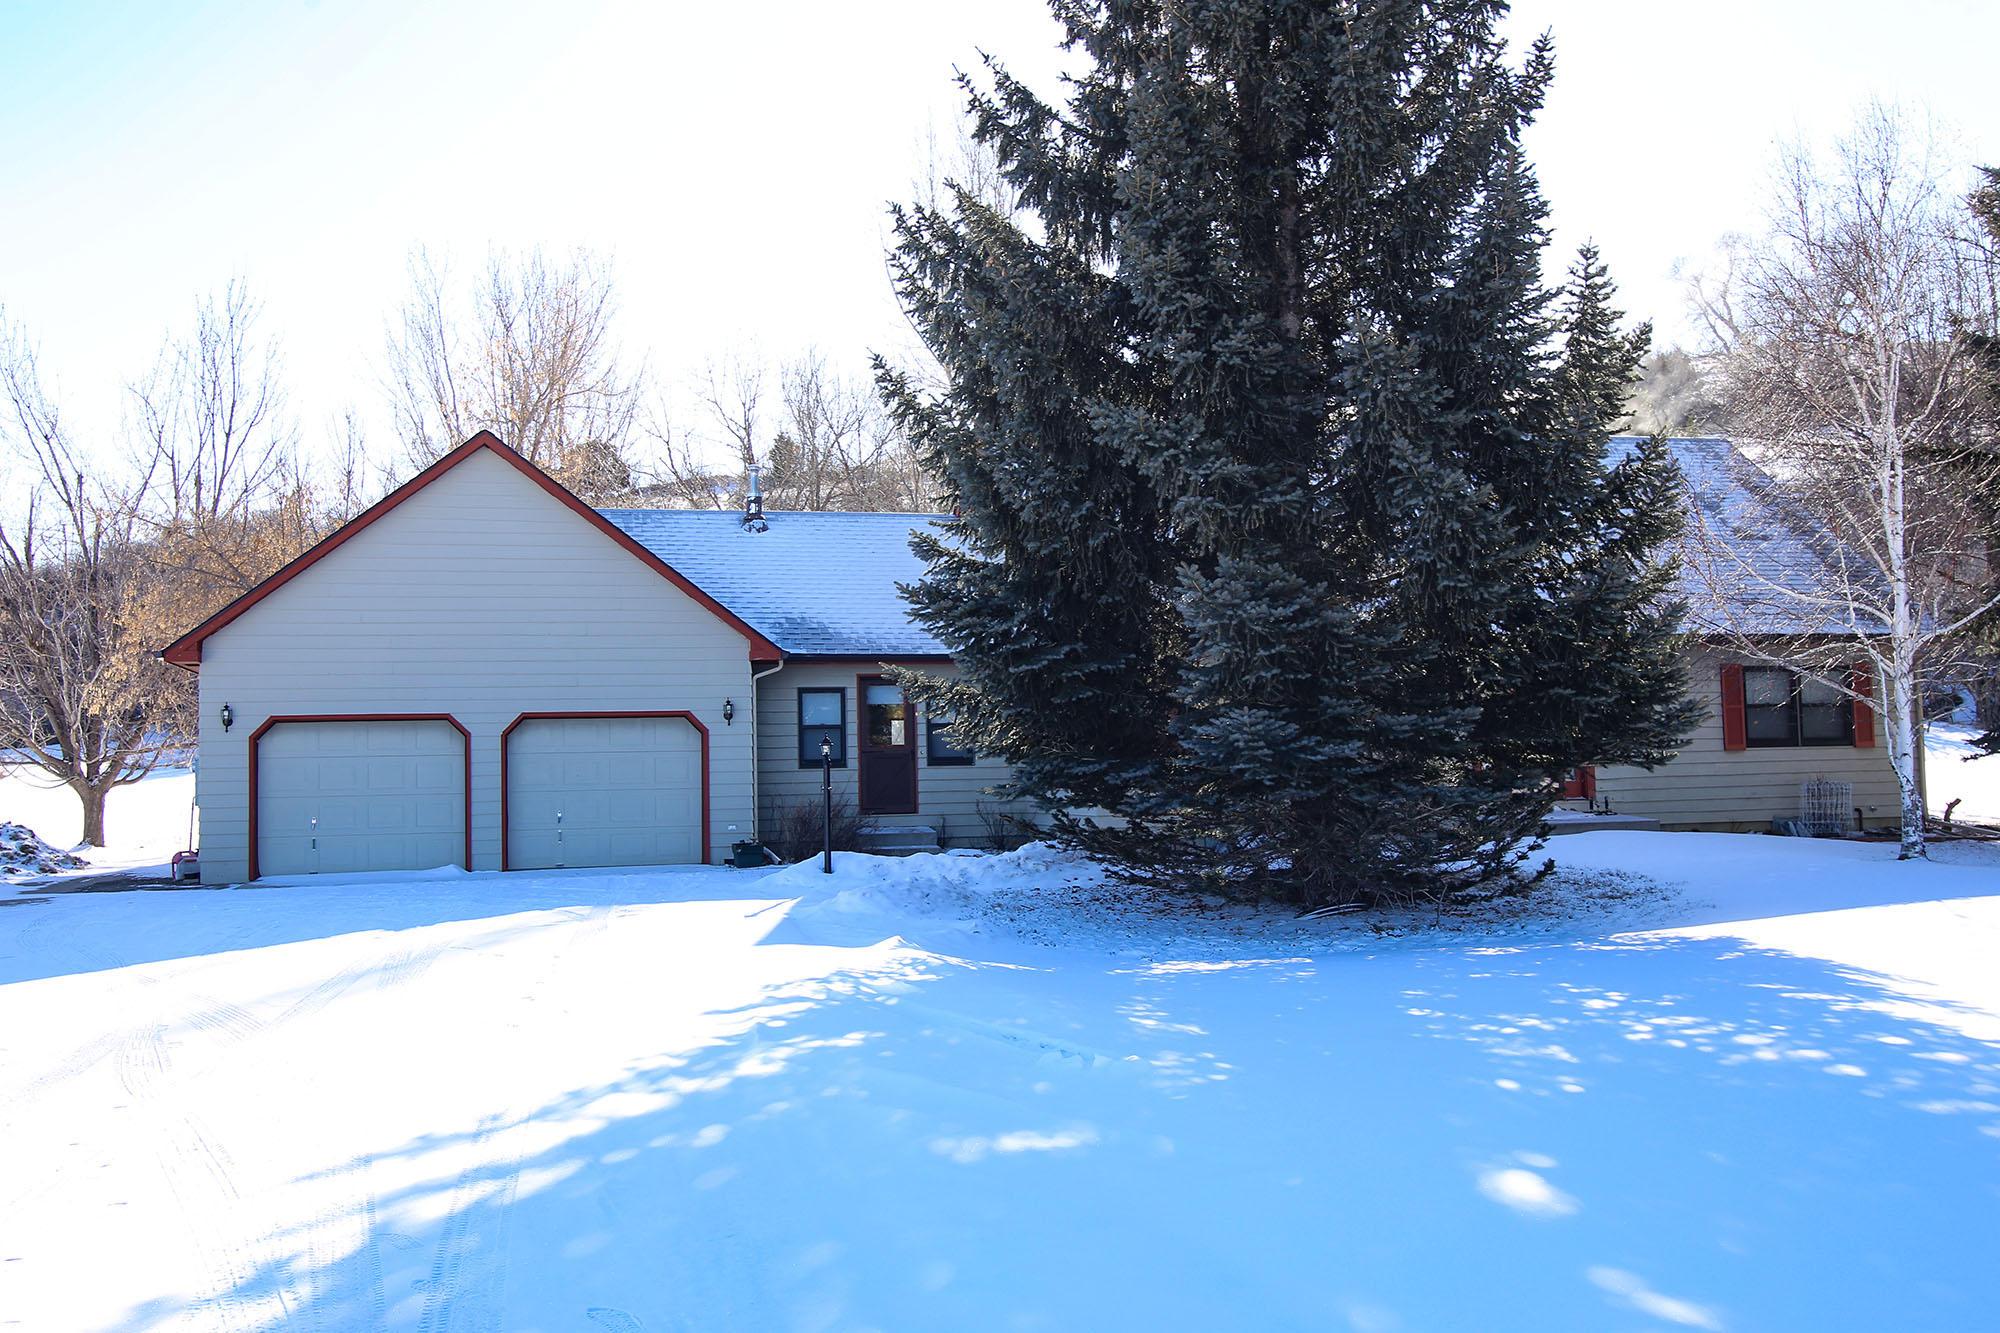 34 Harlequin Drive, Sheridan, Wyoming 82801, 4 Bedrooms Bedrooms, ,2.5 BathroomsBathrooms,Residential,For Sale,Harlequin,19-142